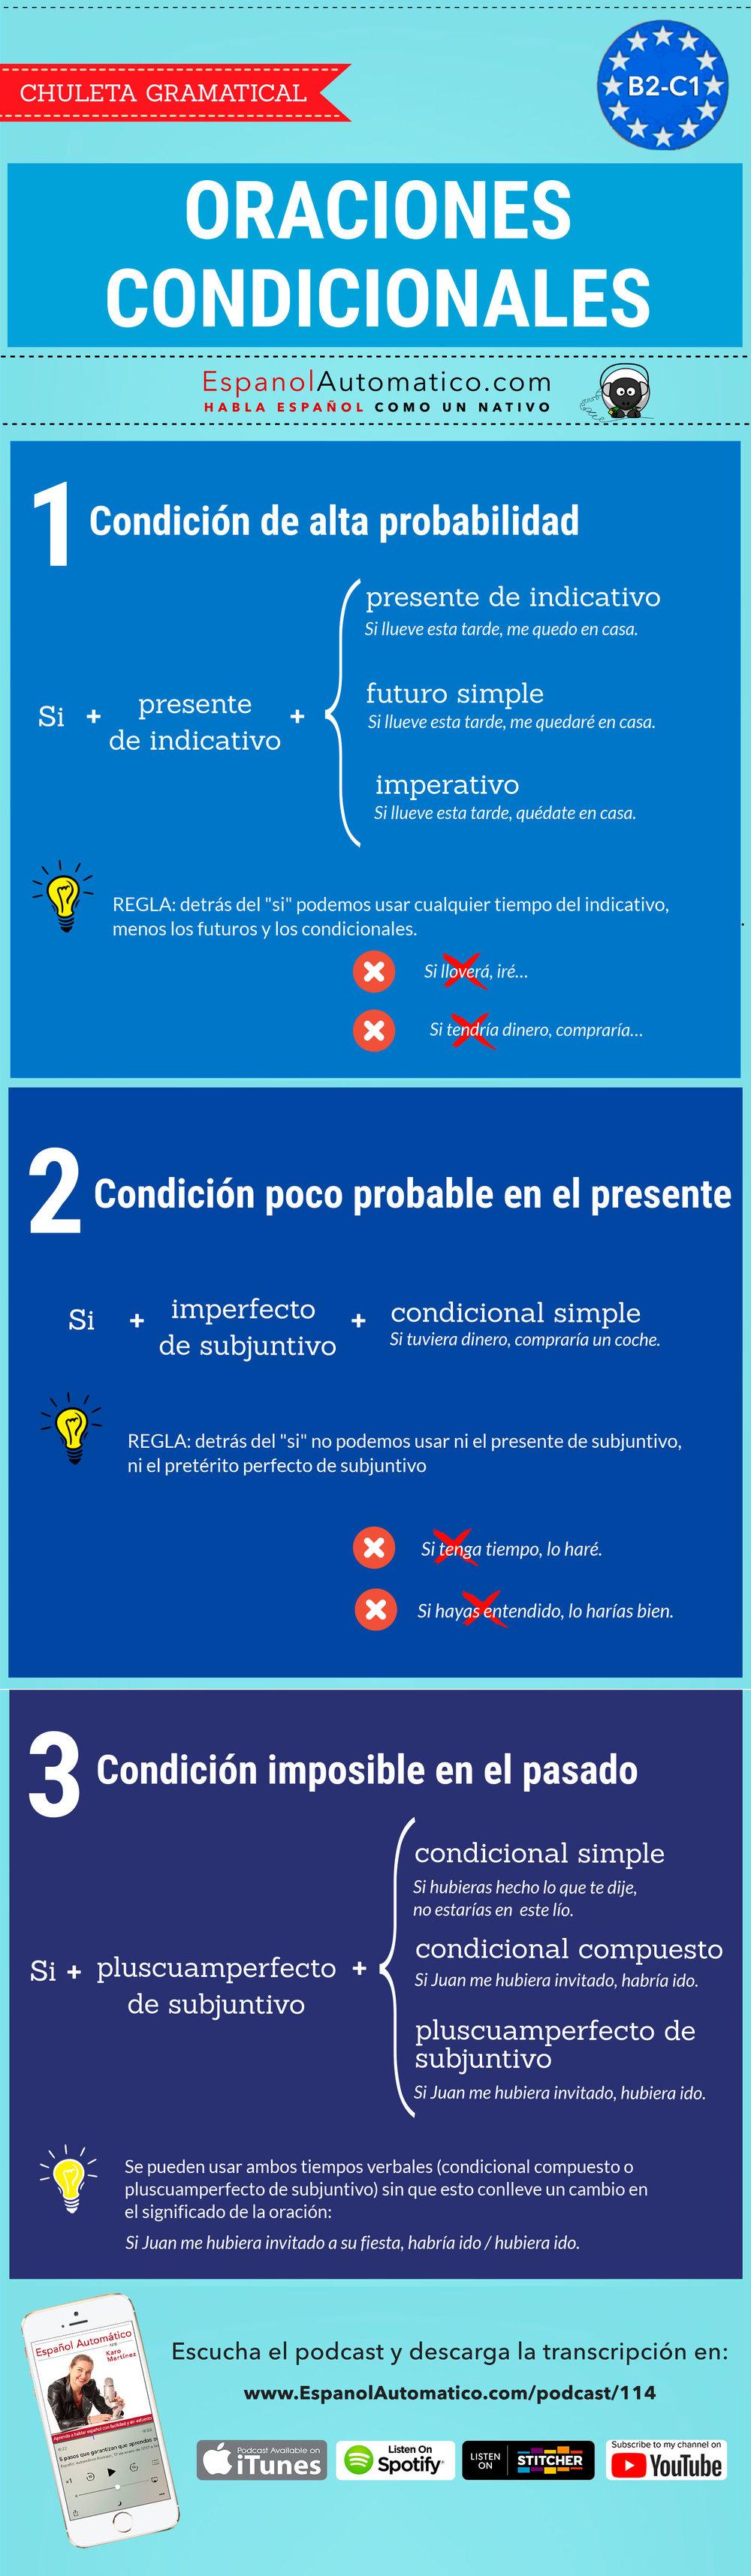 (B2-C1) Errores en el uso de oraciones condicionales con SI   [Podcast 114] Learn Spanish in fun and easy way with our award-winning podcast: http://espanolautomatico.com/podcast/114 REPIN for later #teachspanish #spanishteacher #speakspanish #spanishlessons #learnspanishforadults #learnspanishforadultsfree #learningspanish #learningspanishlanguage